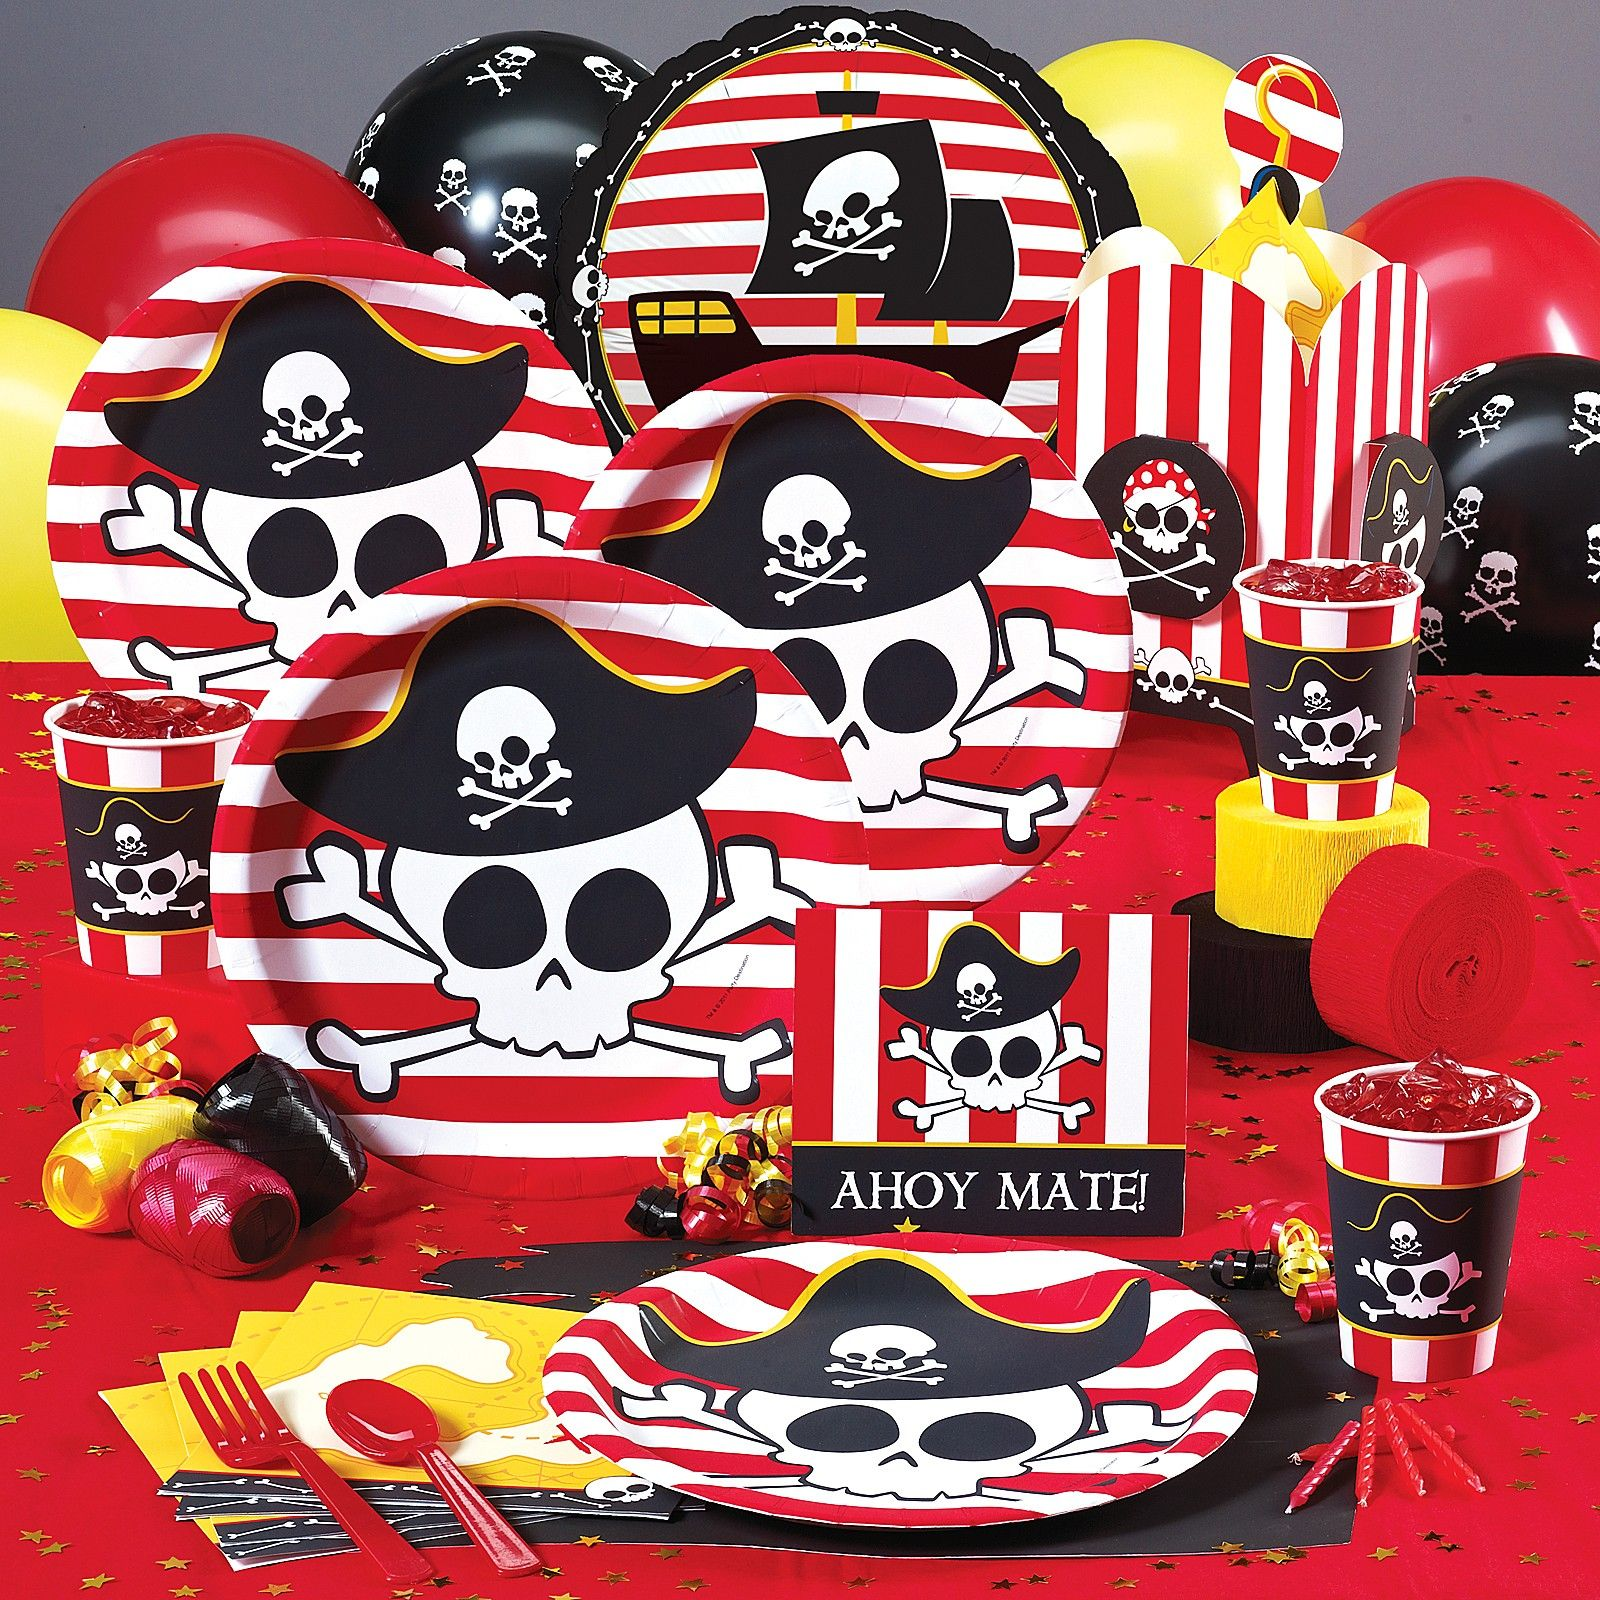 Pirate Theme Party Decoration Ideas Part - 31: Little Buccaneer Pirate Decorations